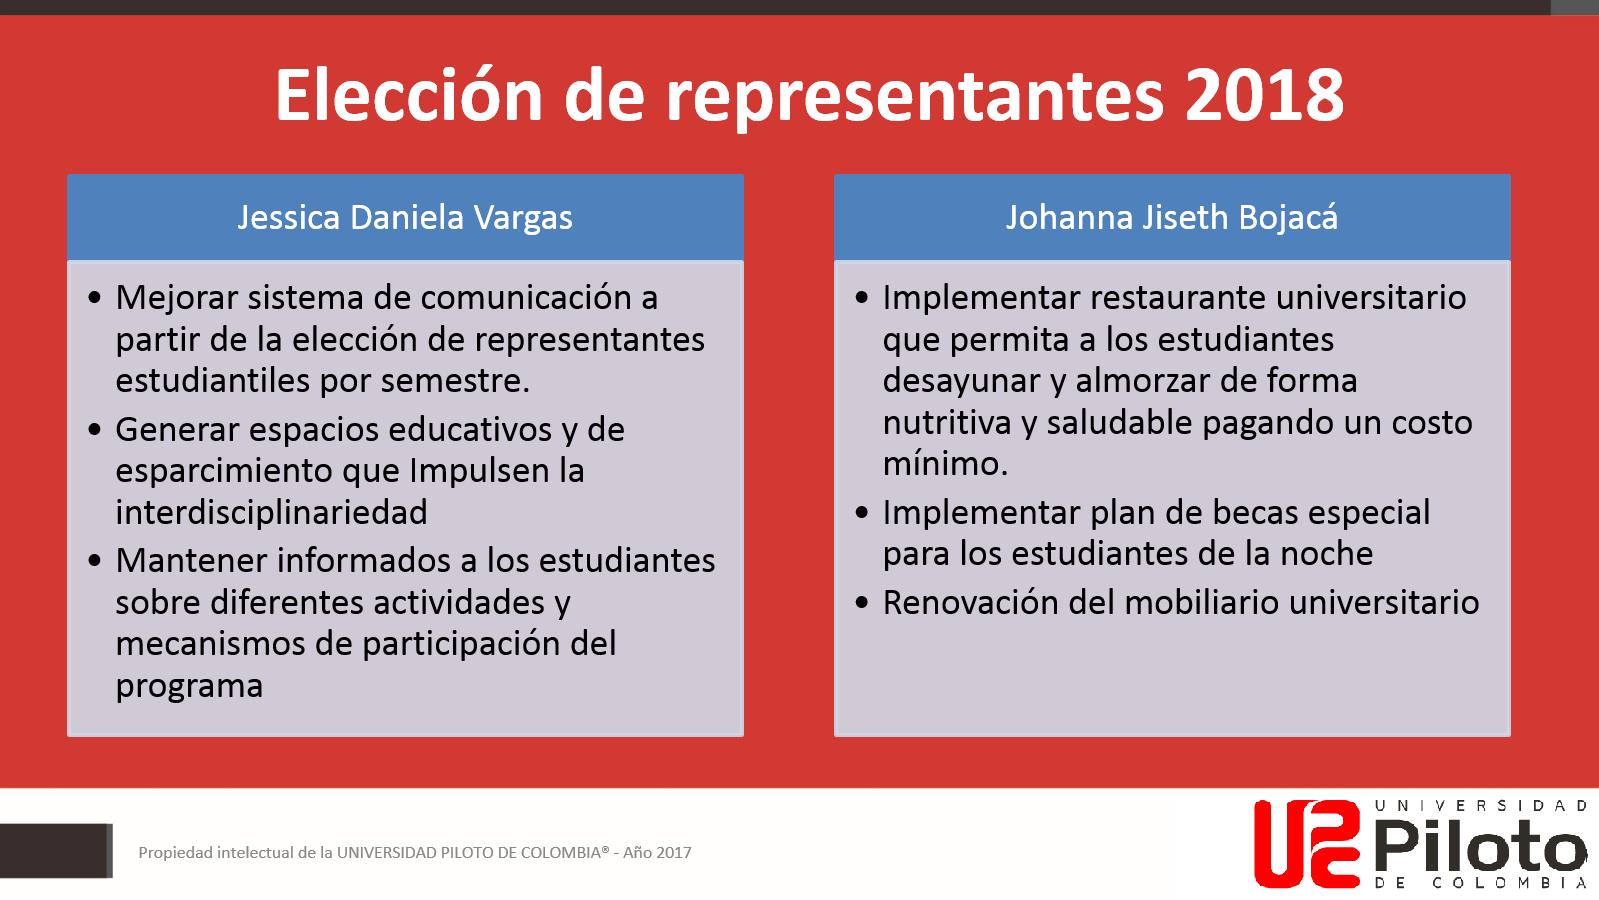 Representantes 2018